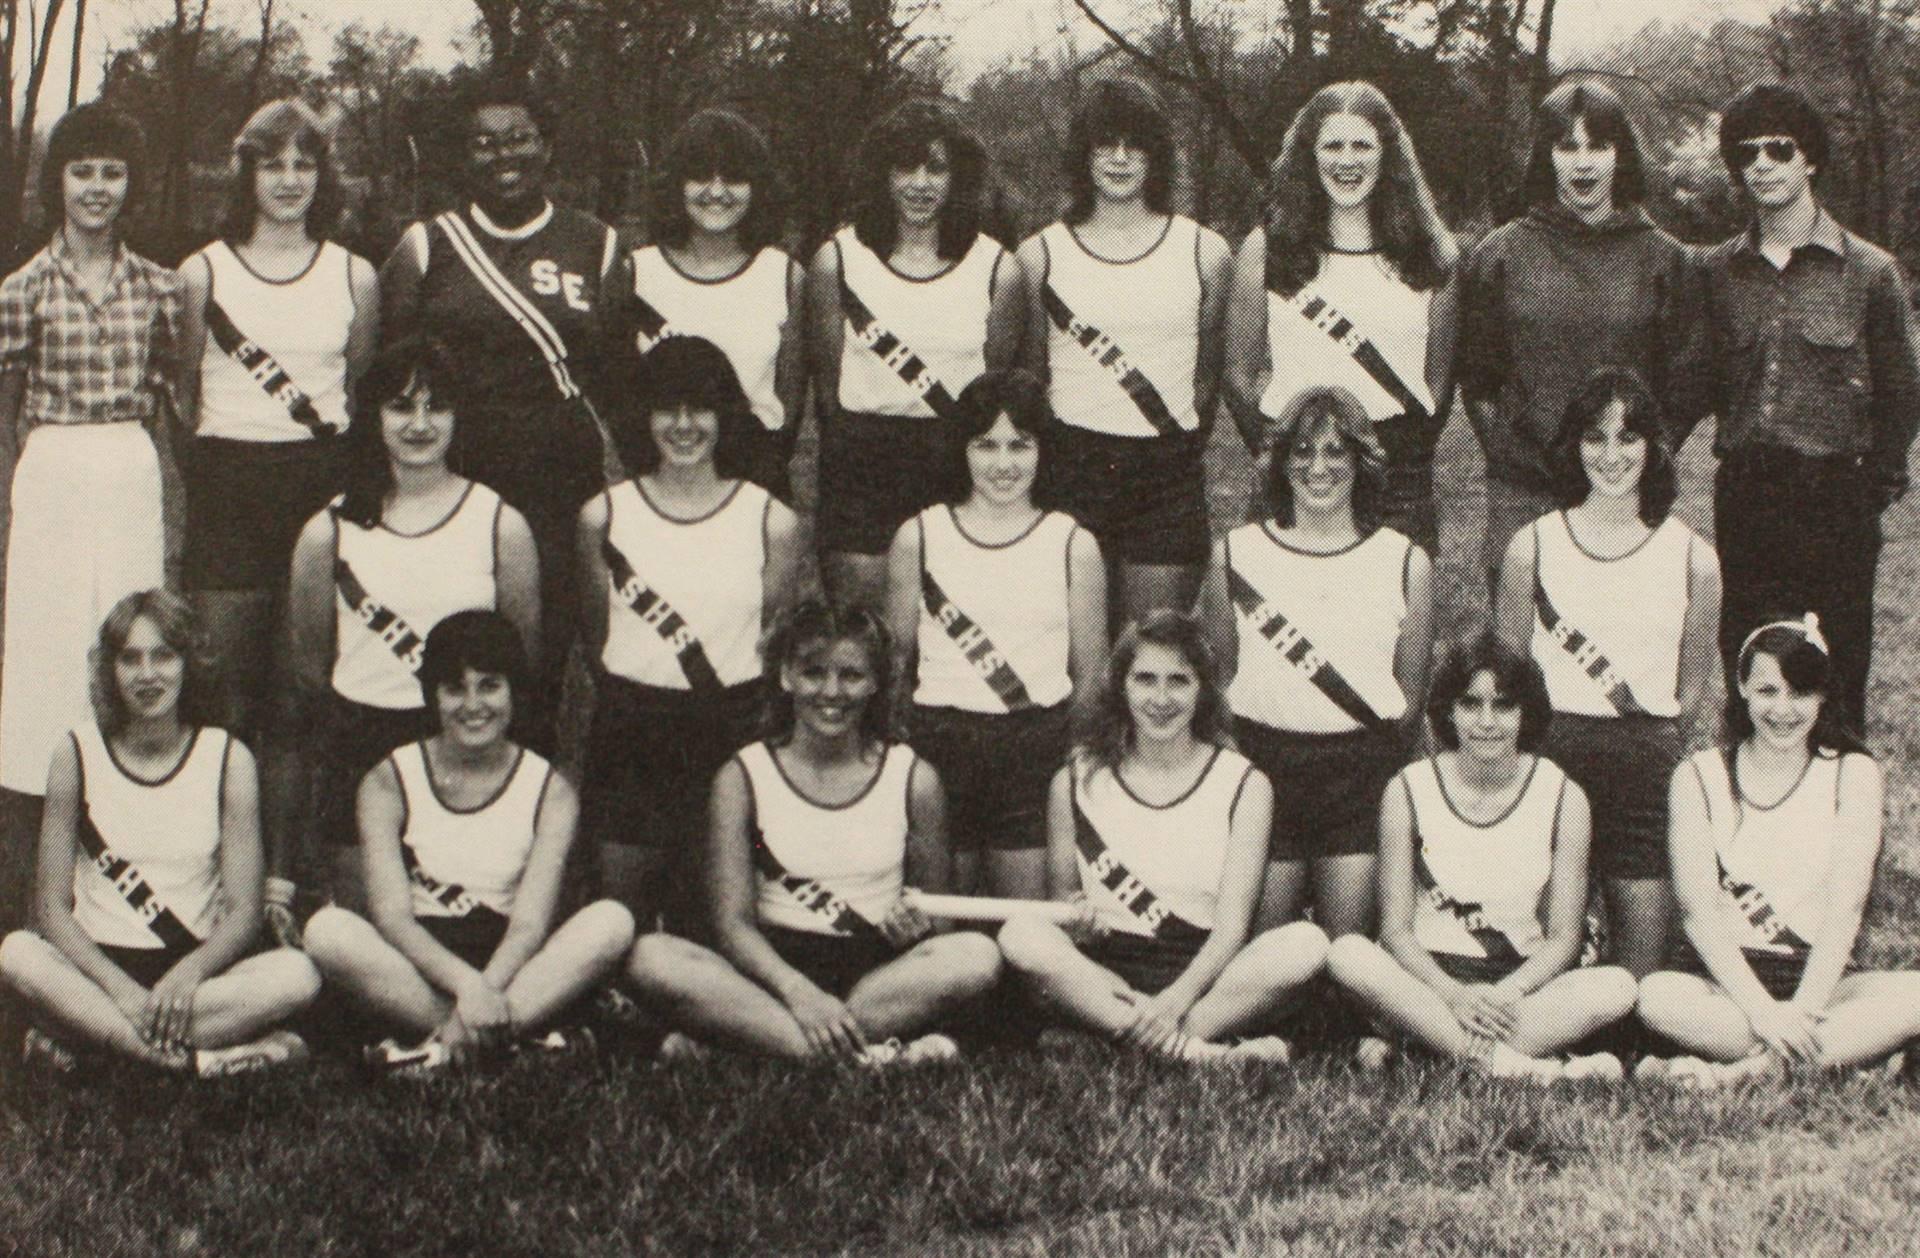 1981 High School Track